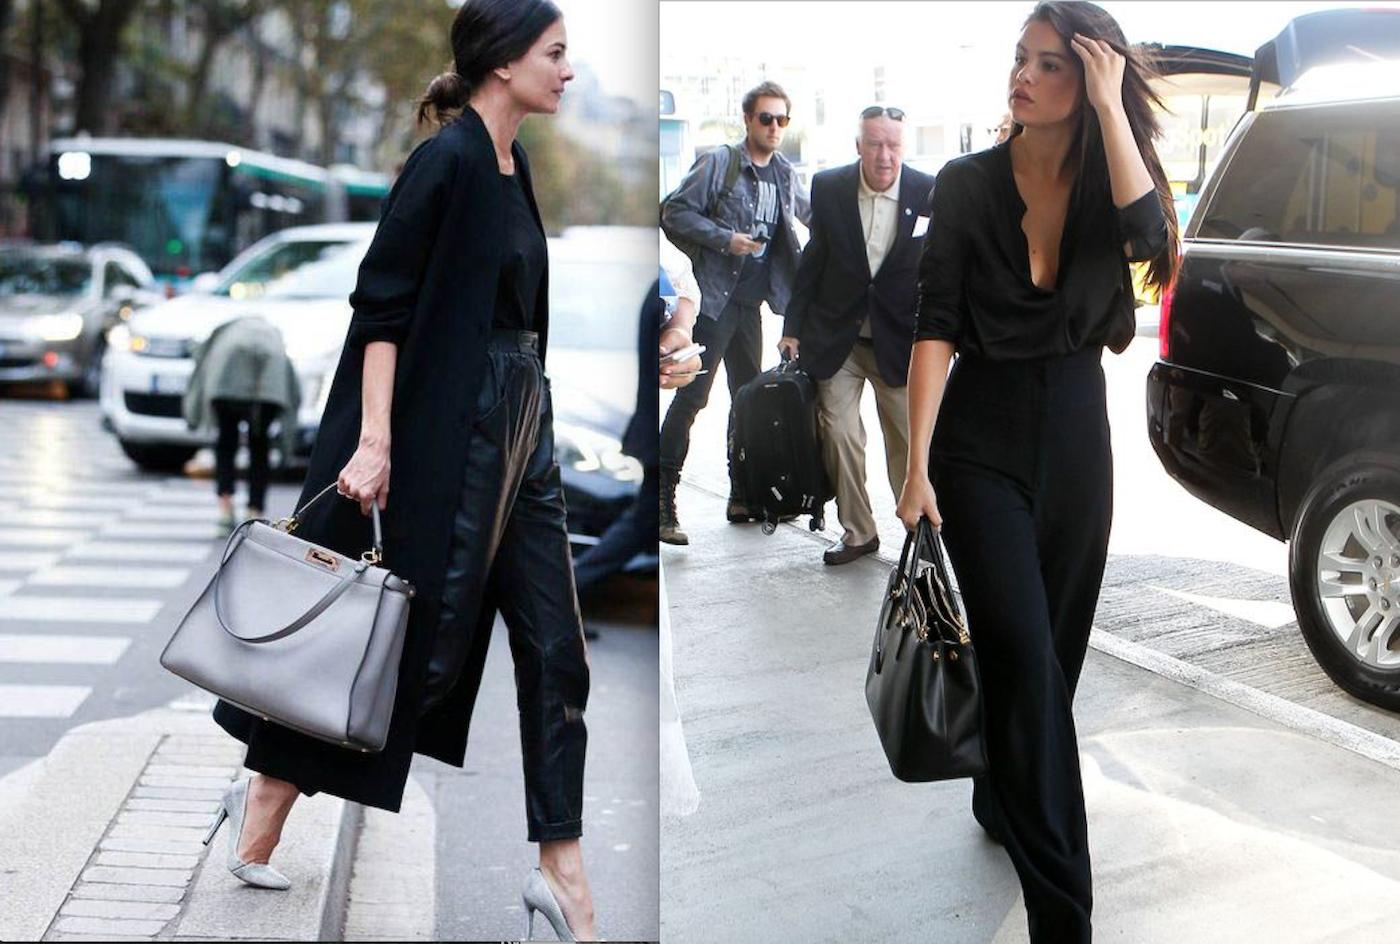 Designer Bags for work